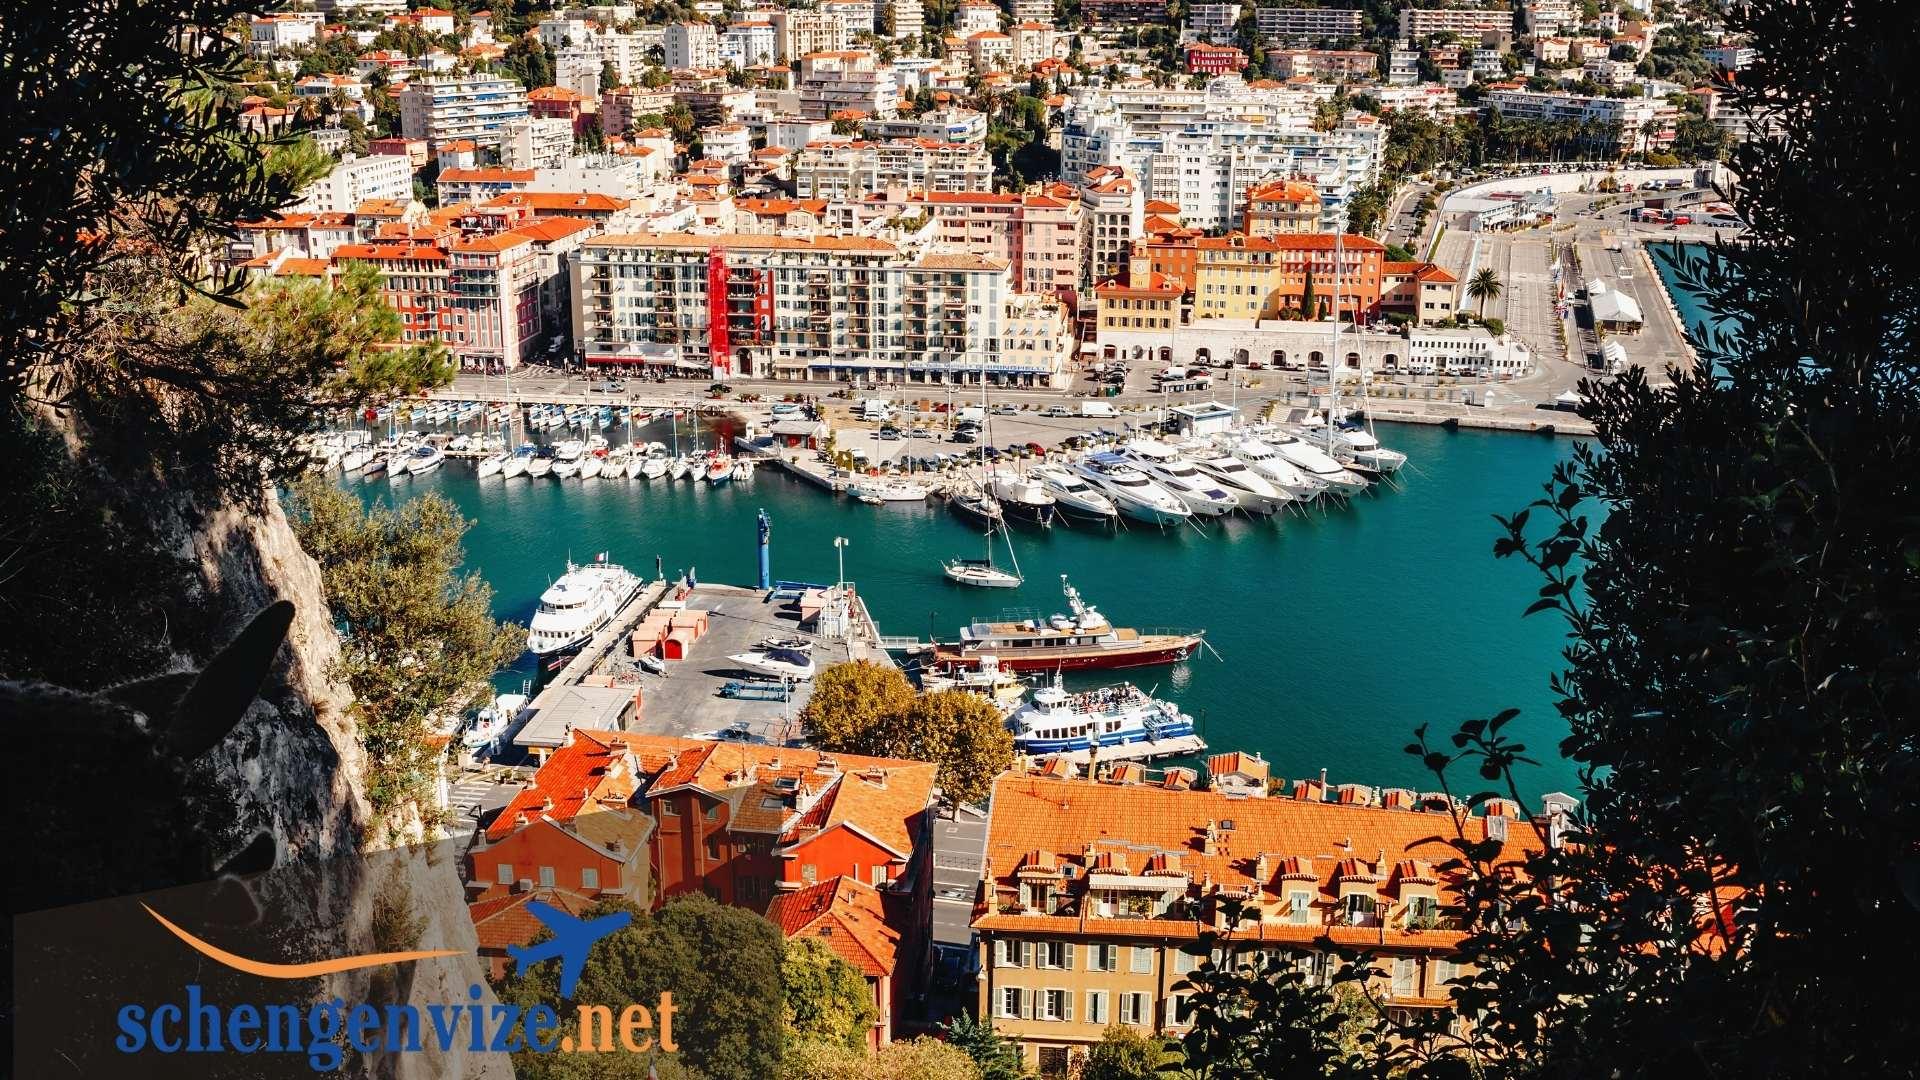 Fransa Turistik Vize Dilekçesi